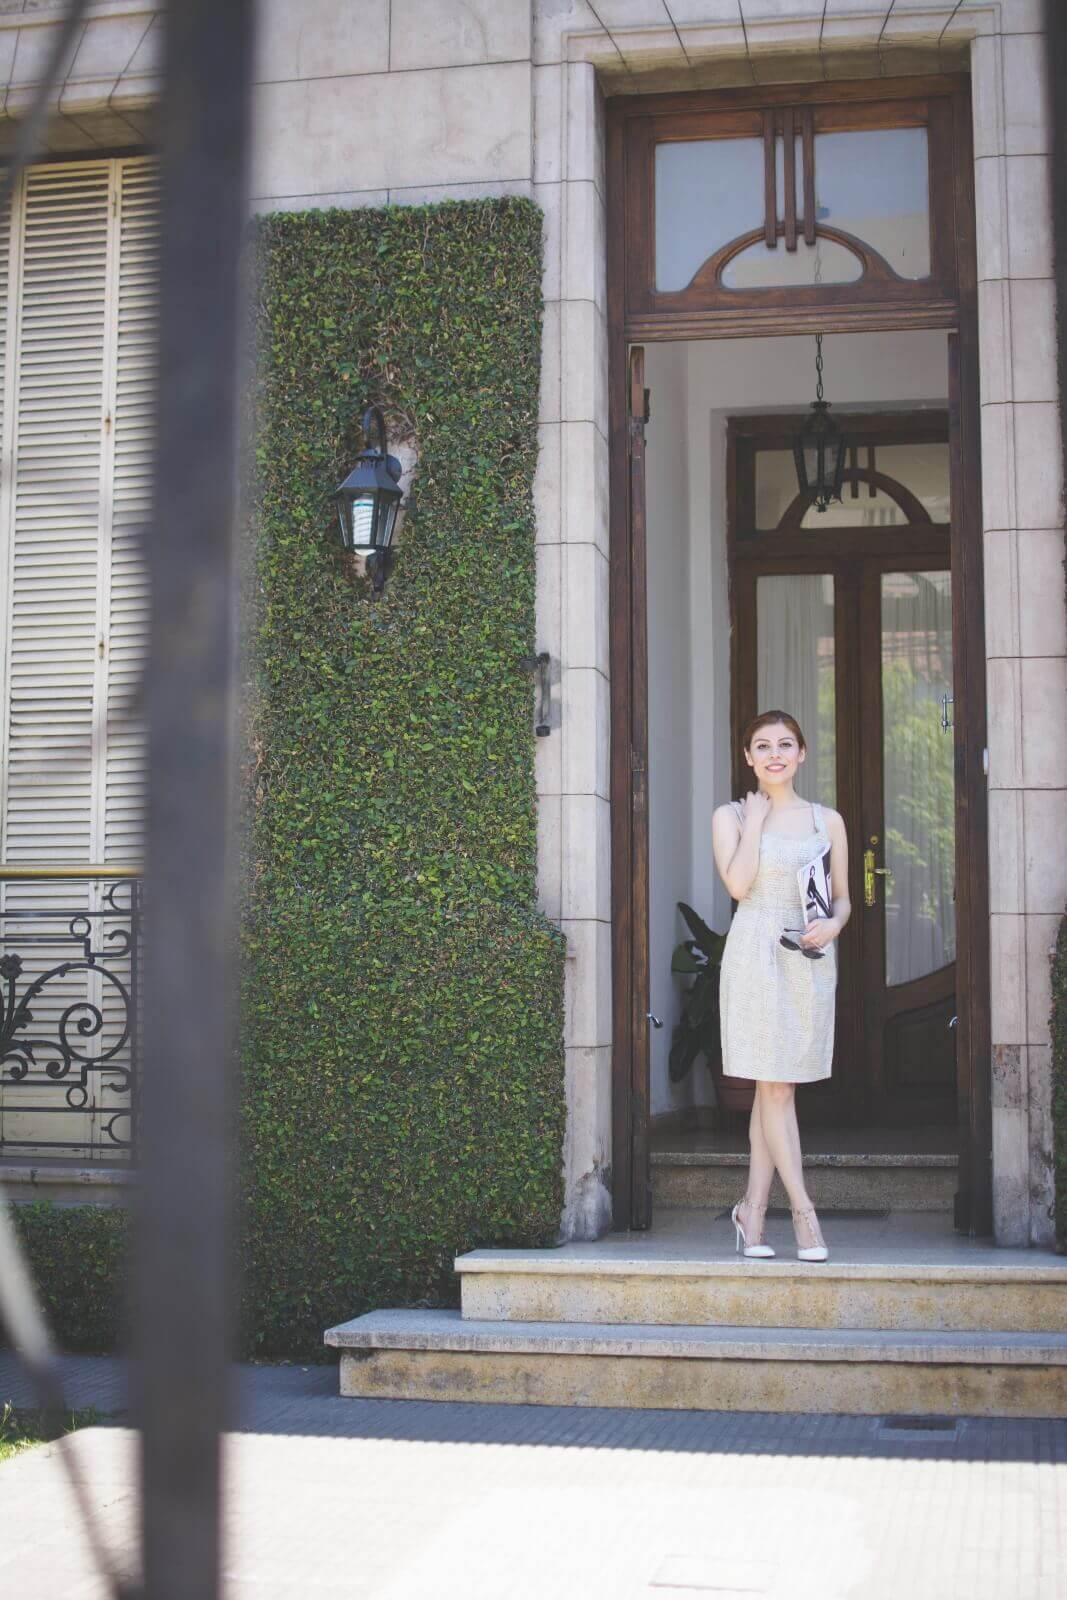 almond-white-dress-sammydress-stilettos-valentino-rockstud-imitation-deborah-ferrero-style-by-deb-ladylike09